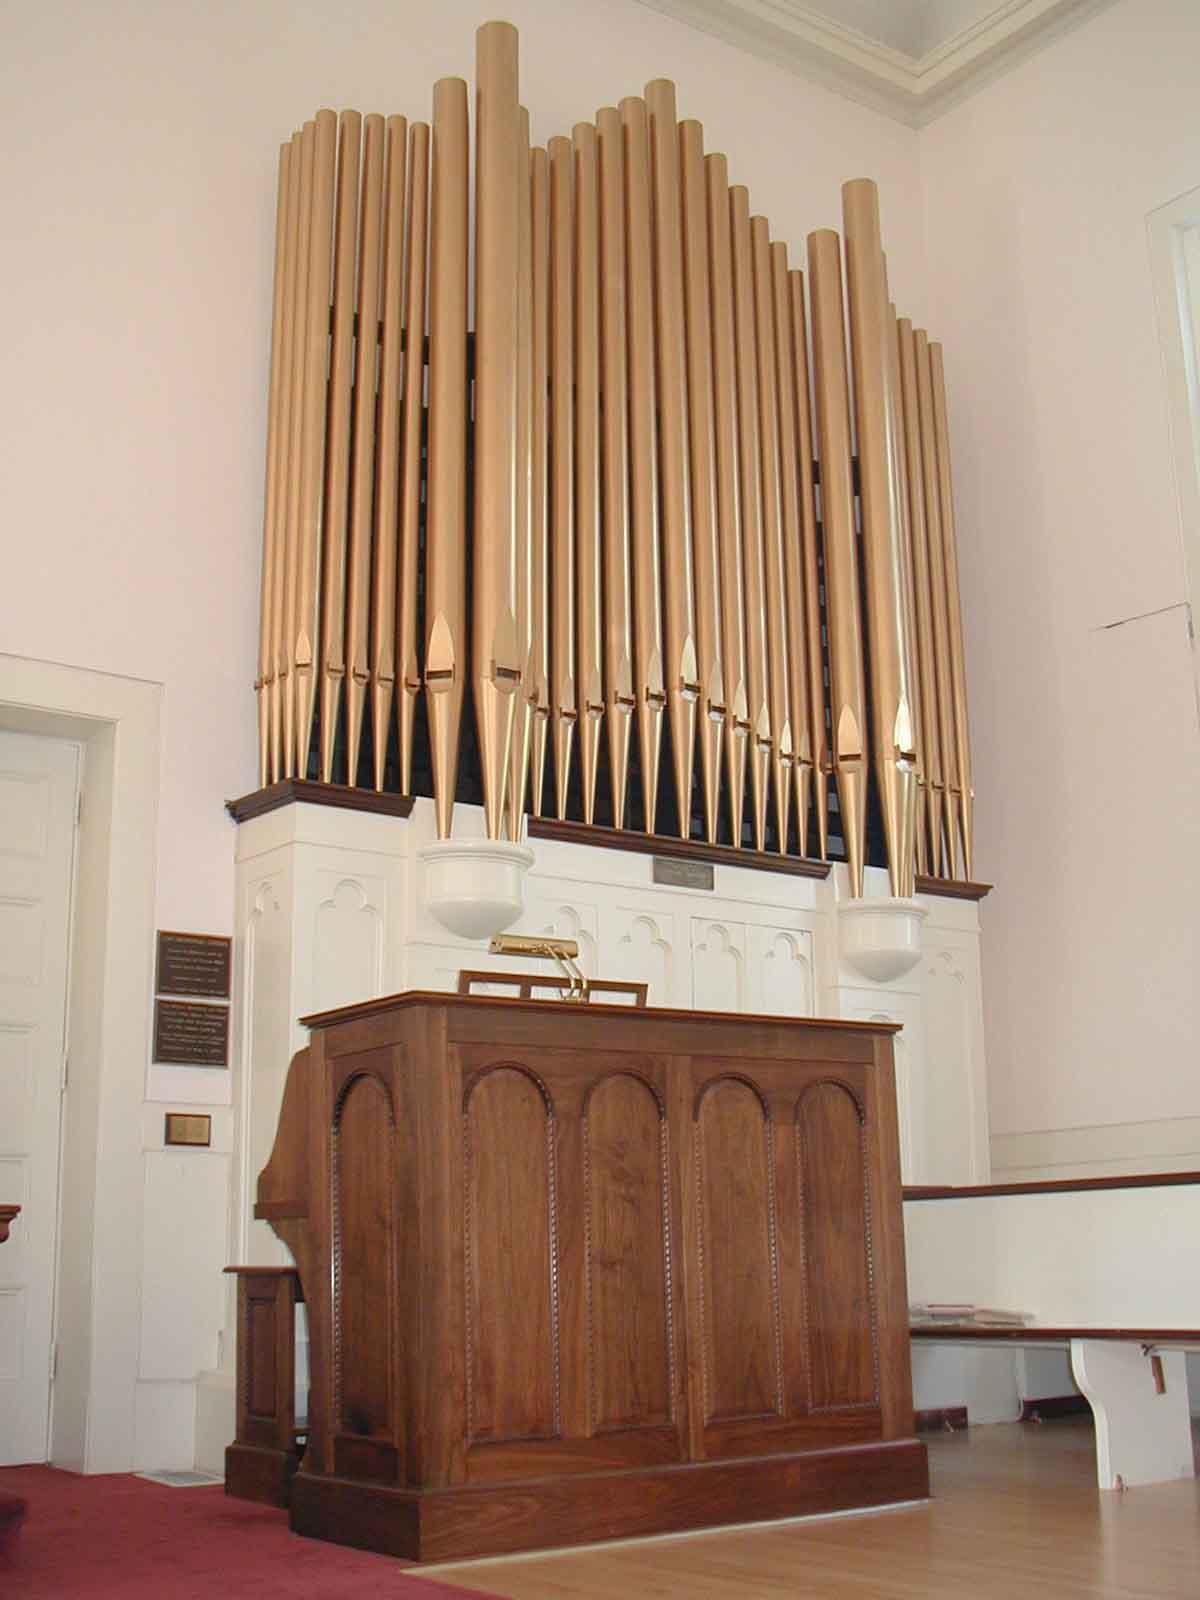 Aeolian-Skinner Organ at First Congregational Church, Milton, MA